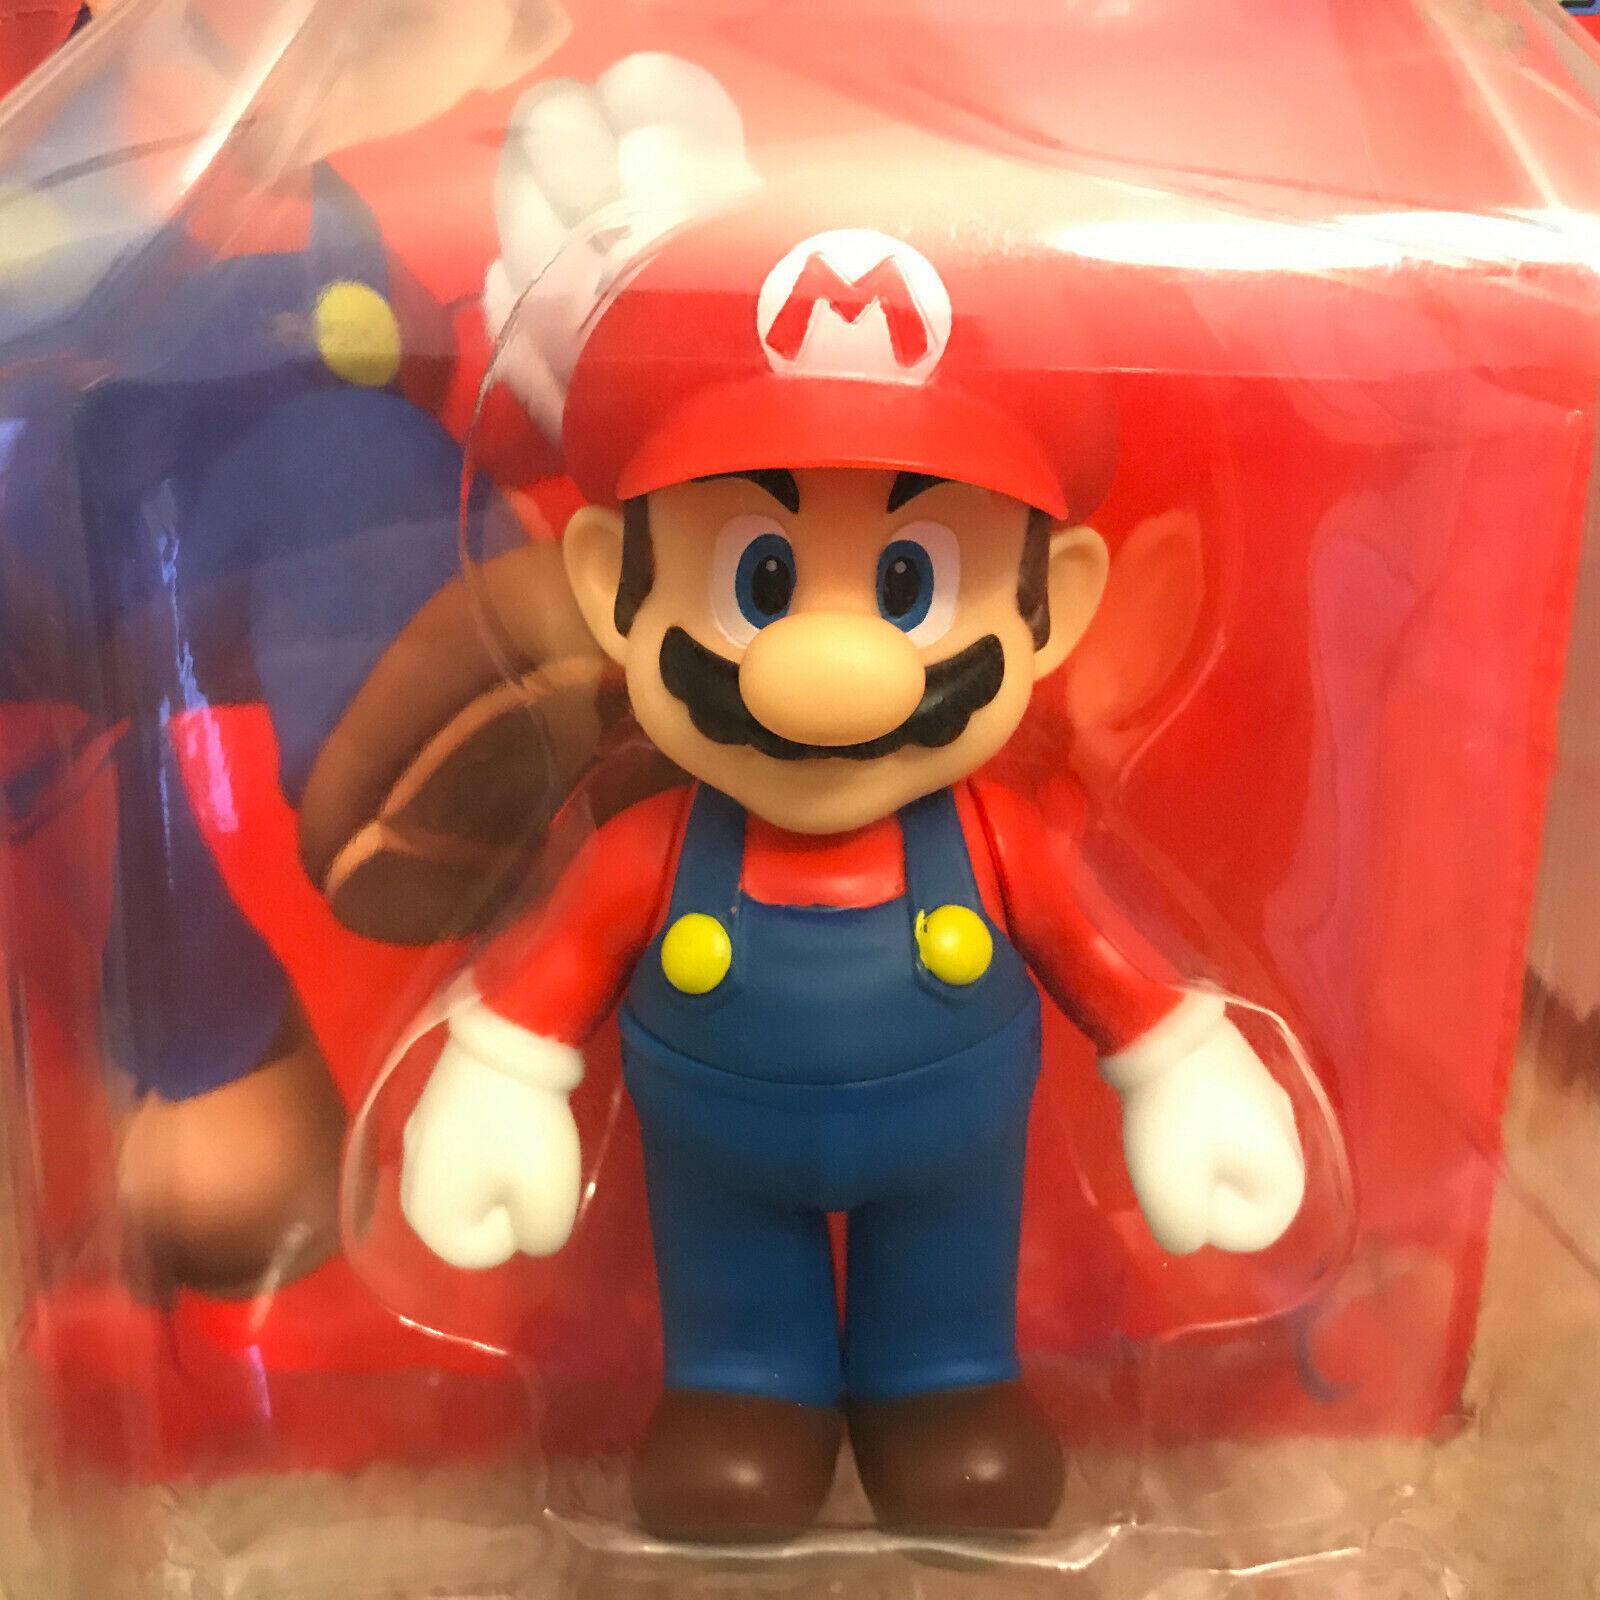 Mario figure figure figure Series 1 - Banpresto 2009 Compelete Set 5 Figures 100% Authentic OG 0542b4